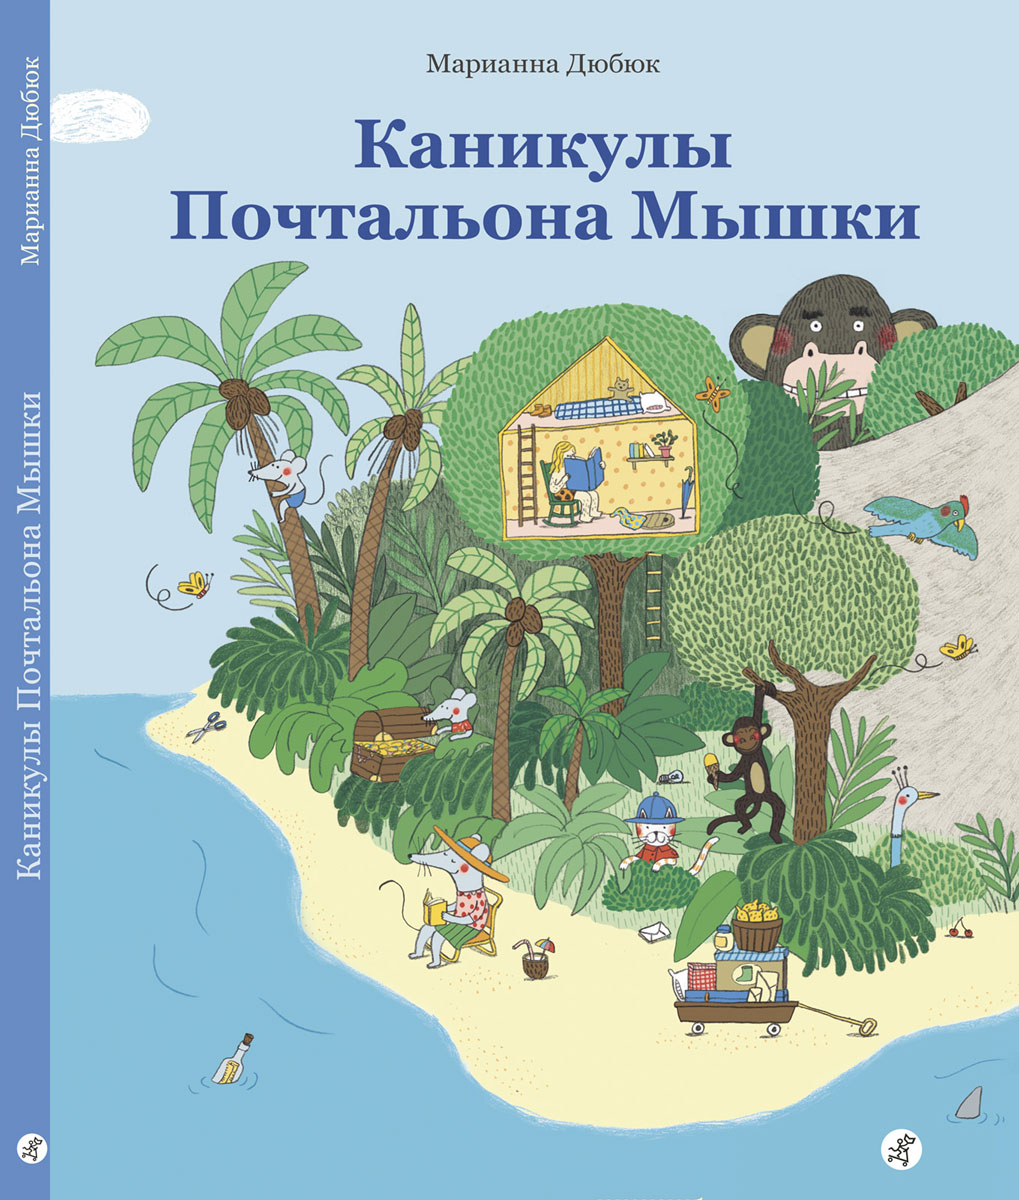 Марианна Дюбюк Каникулы Почтальона Мышки